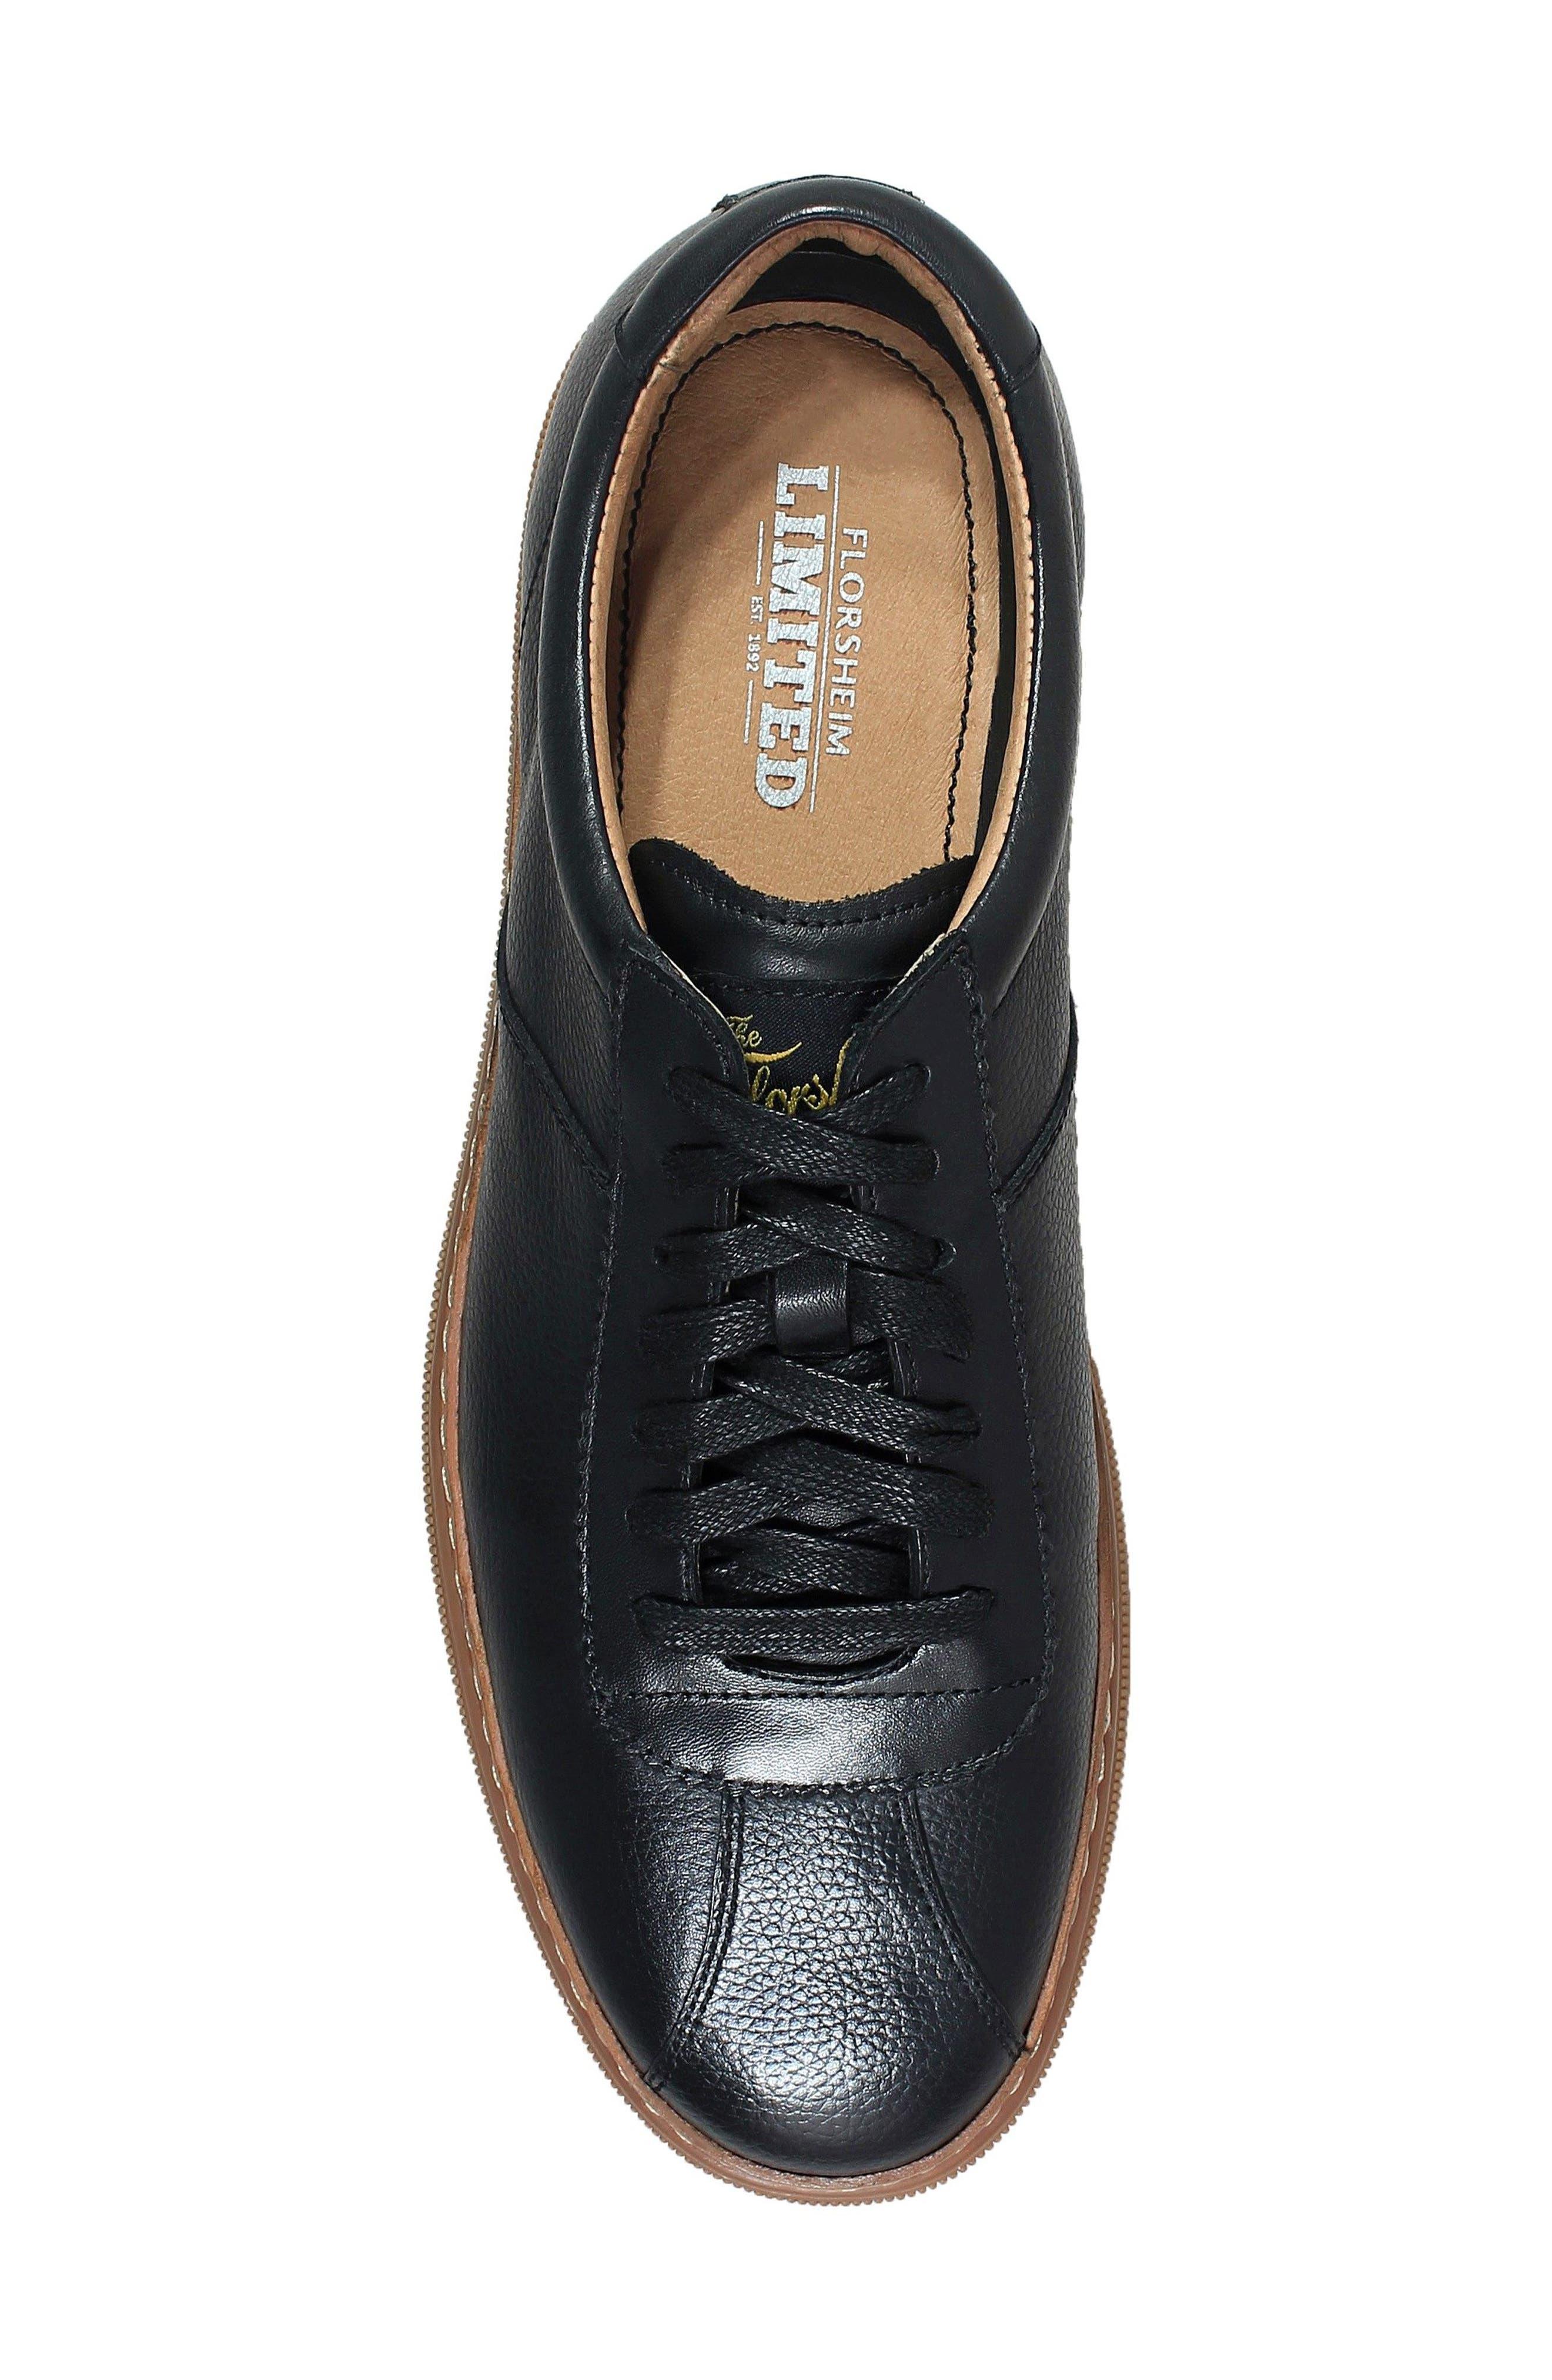 Crew Sneaker,                             Alternate thumbnail 5, color,                             Black